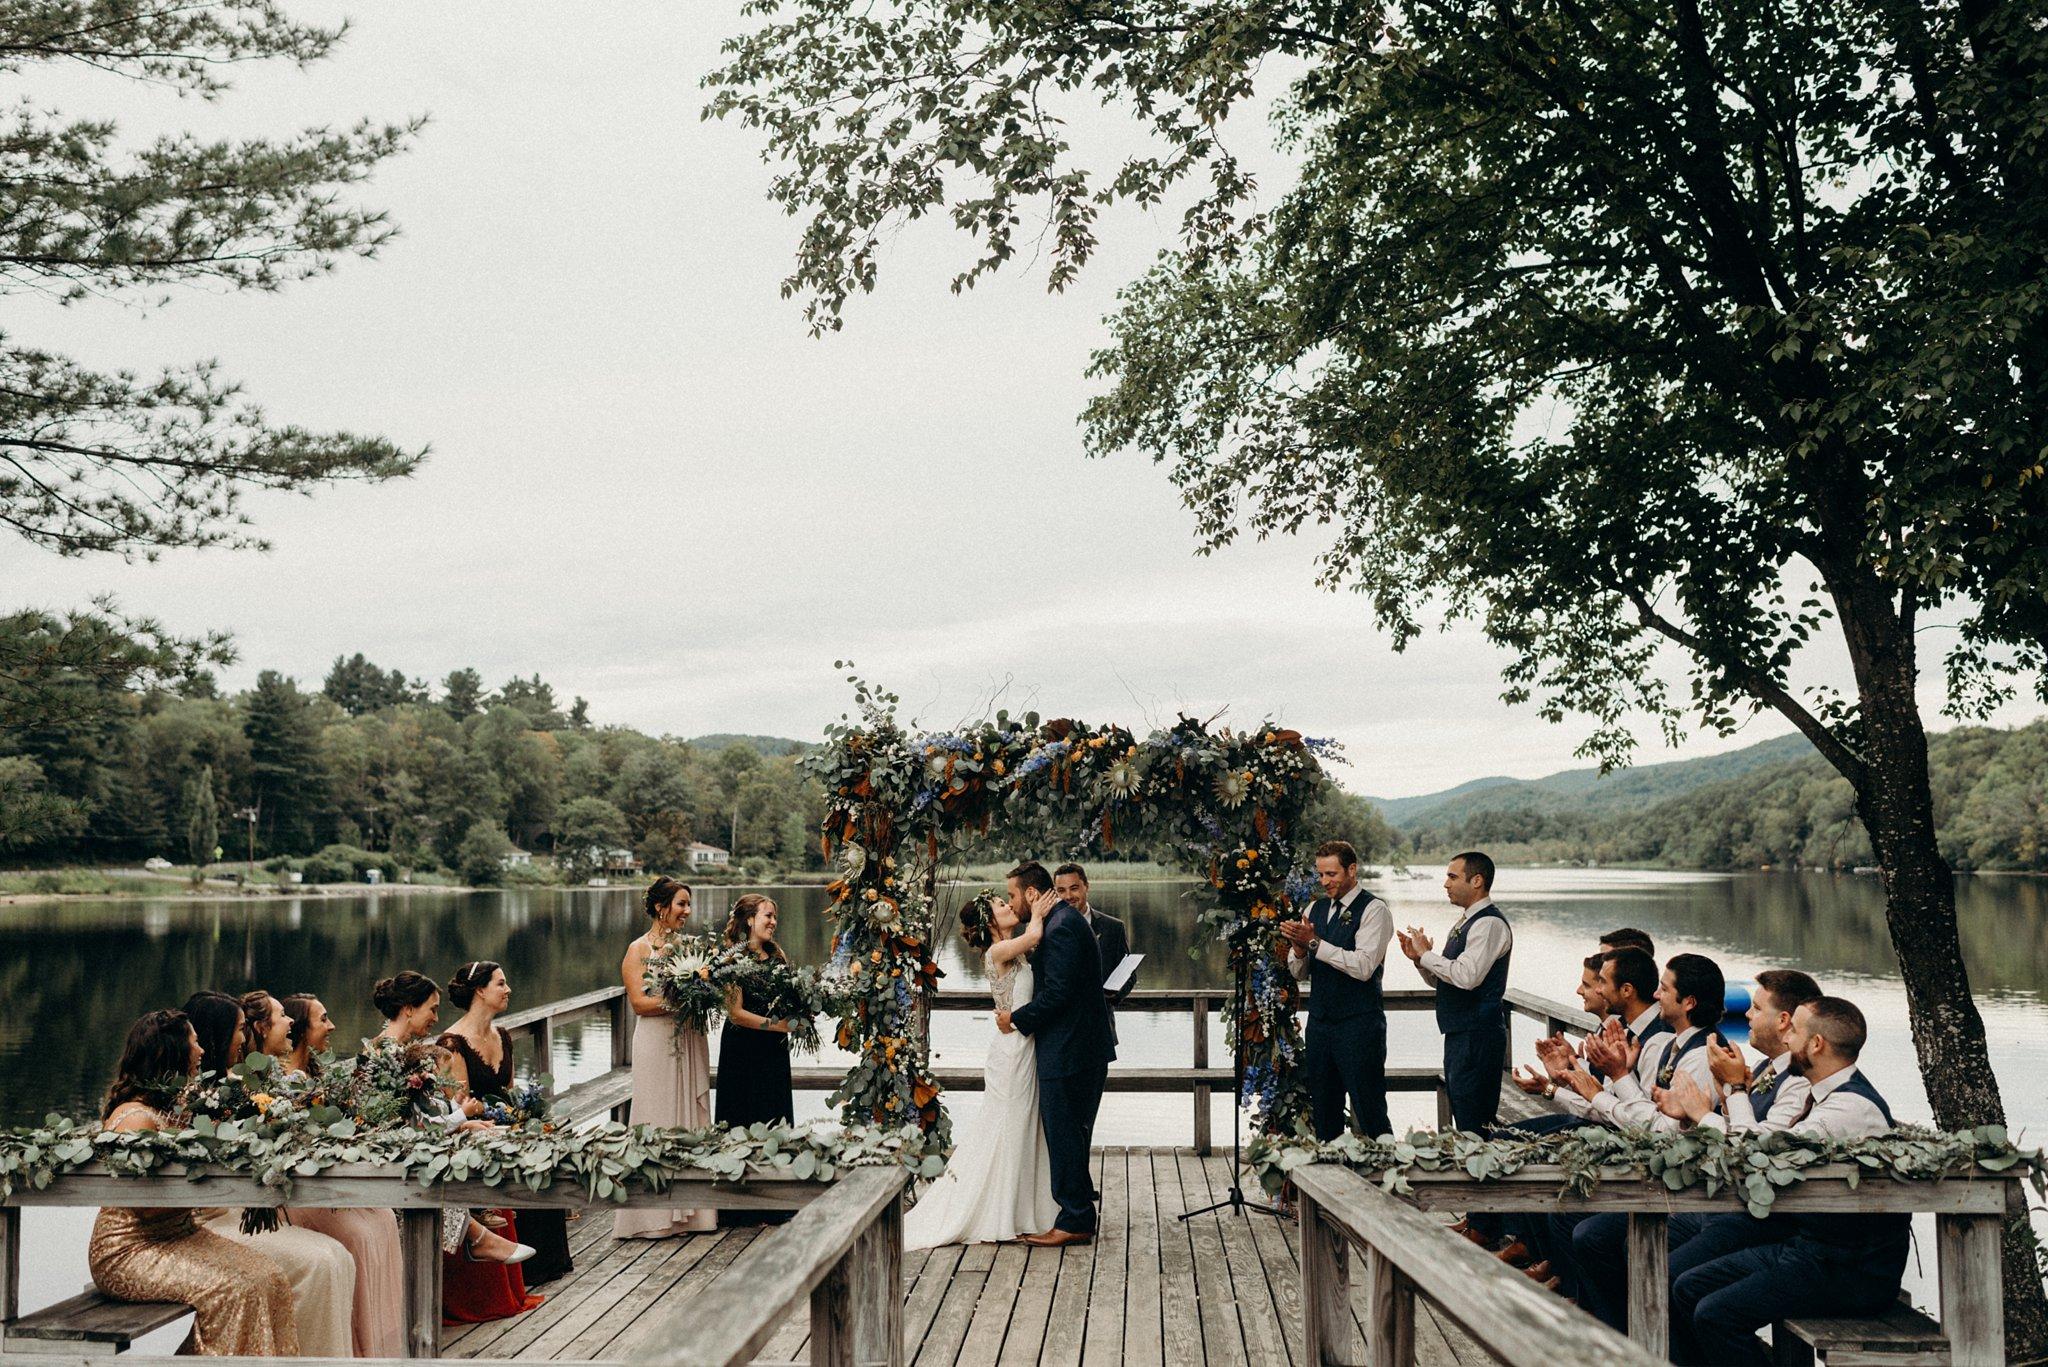 kaihla_tonai_intimate_wedding_elopement_photographer_6646.jpg